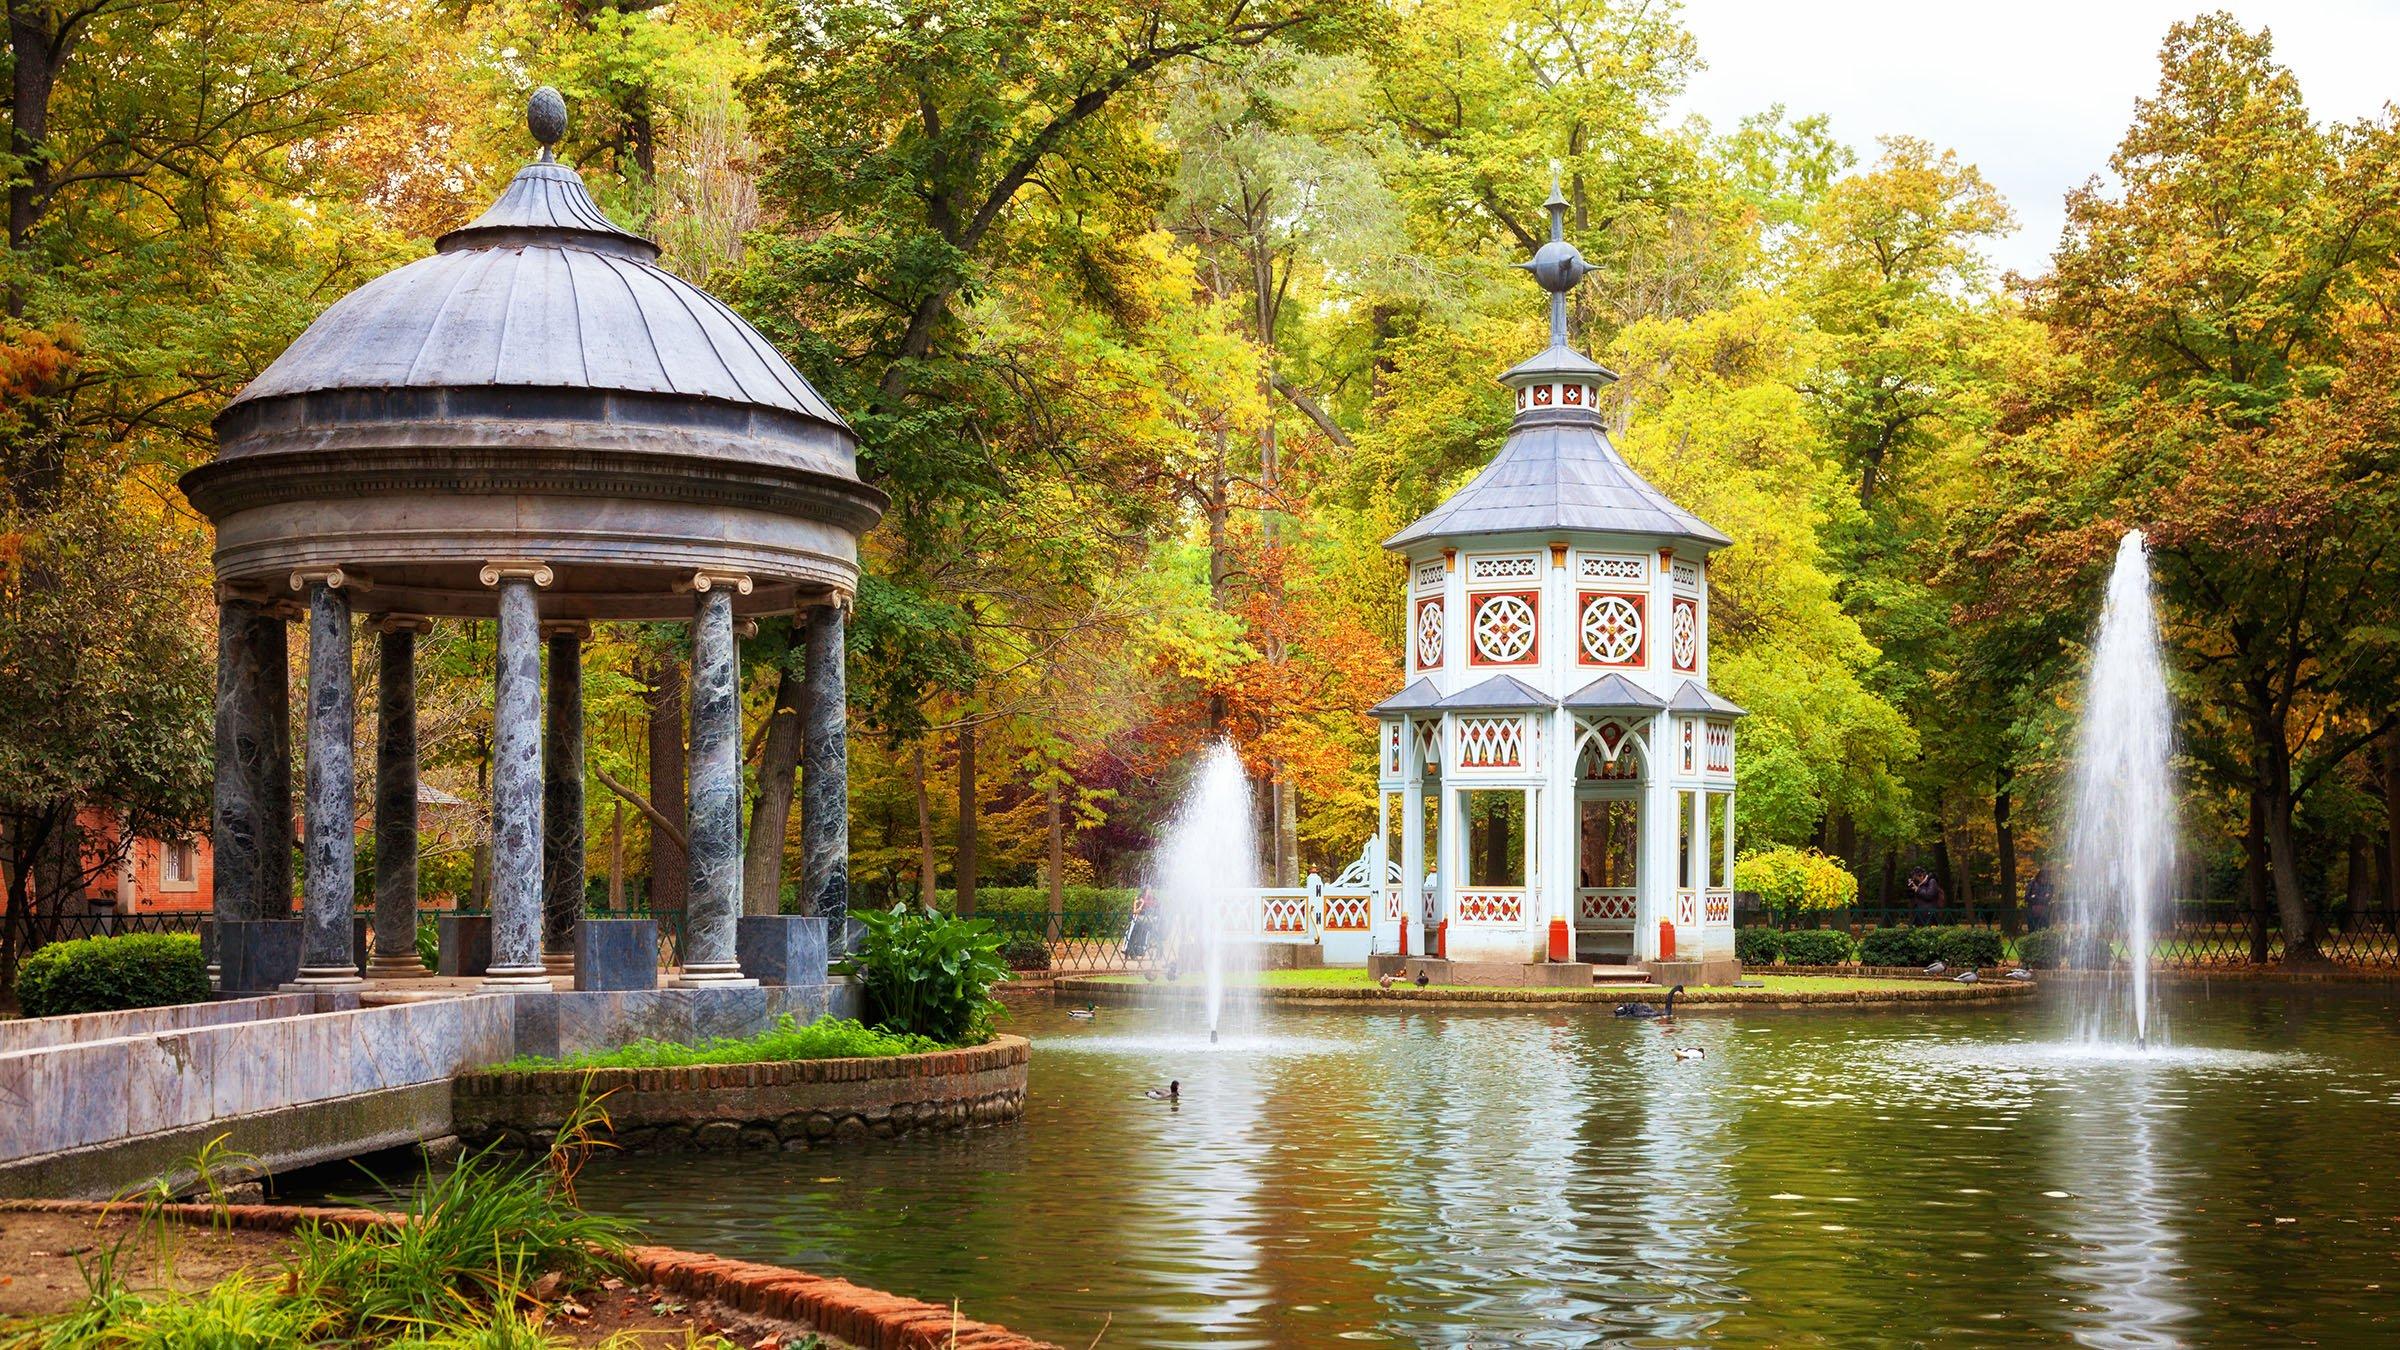 Jardines del pr ncipe aranjuez for Restaurante jardin del principe en aranjuez